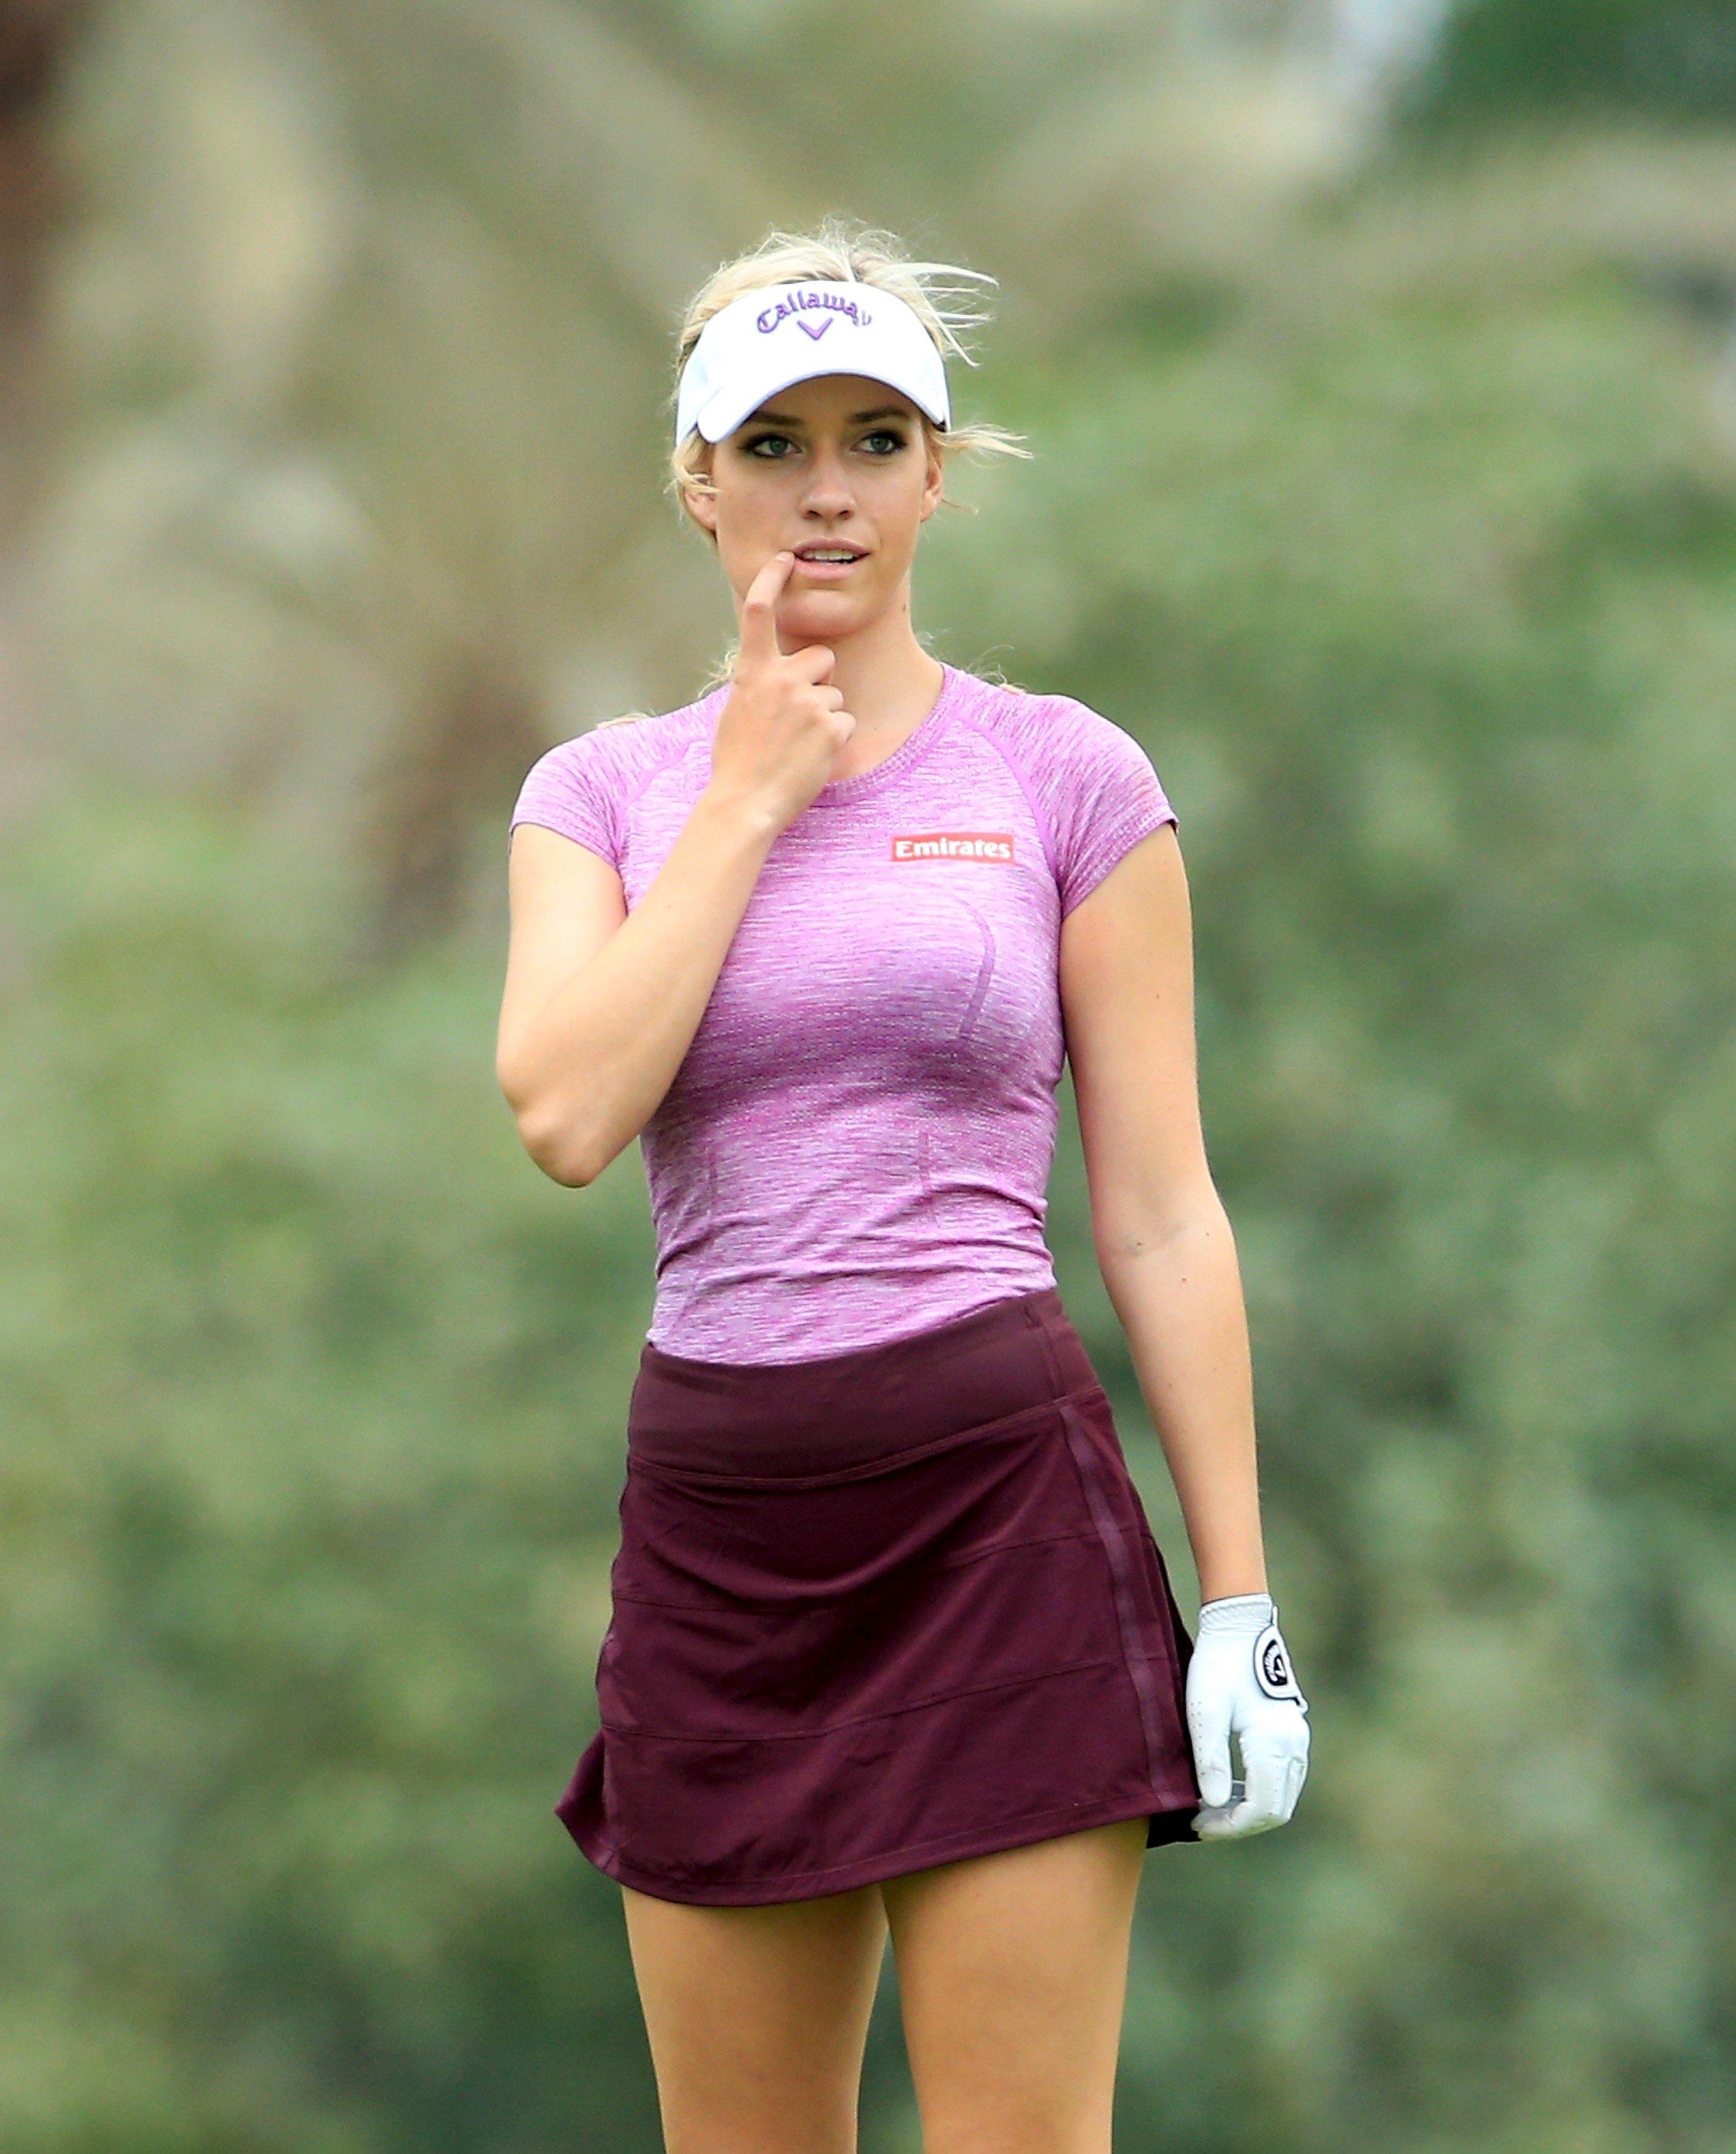 c23caa25aad7 Paige Spiranac s Pro Debut In Dubai Photos - Golf Digest